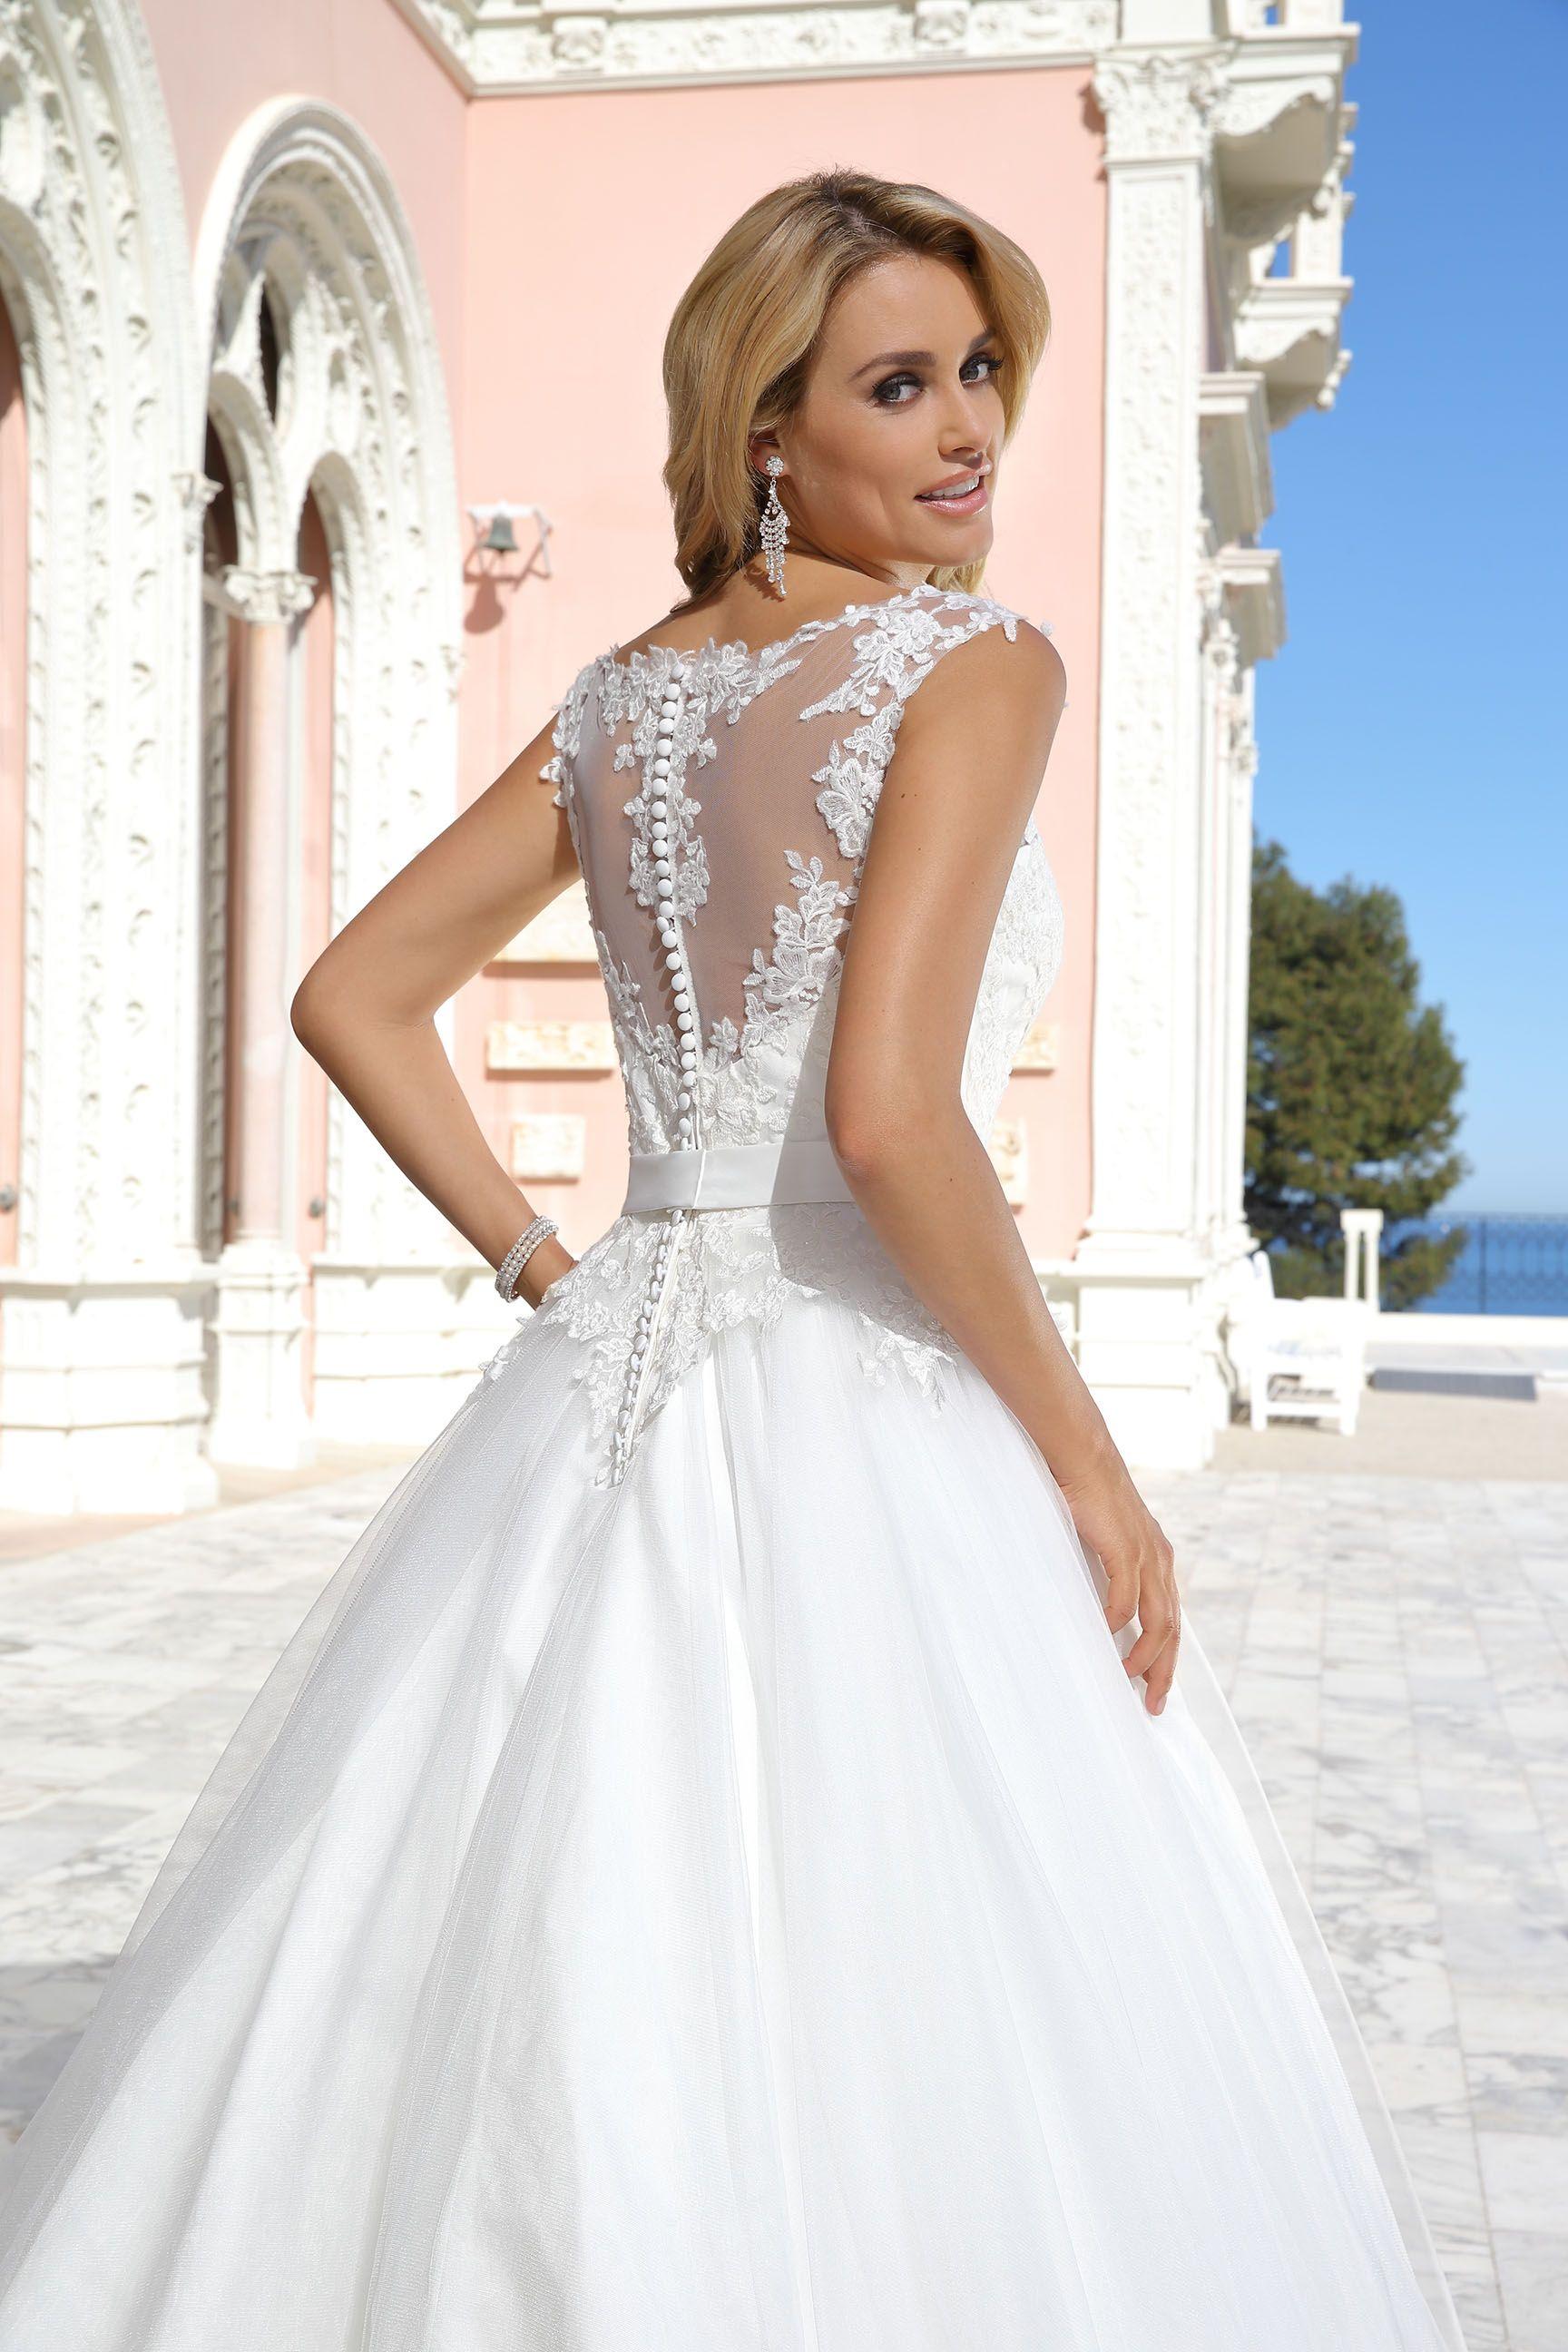 Ladybird Wedding Dress 316072 | Ladybird Collection 2016 | Pinterest ...